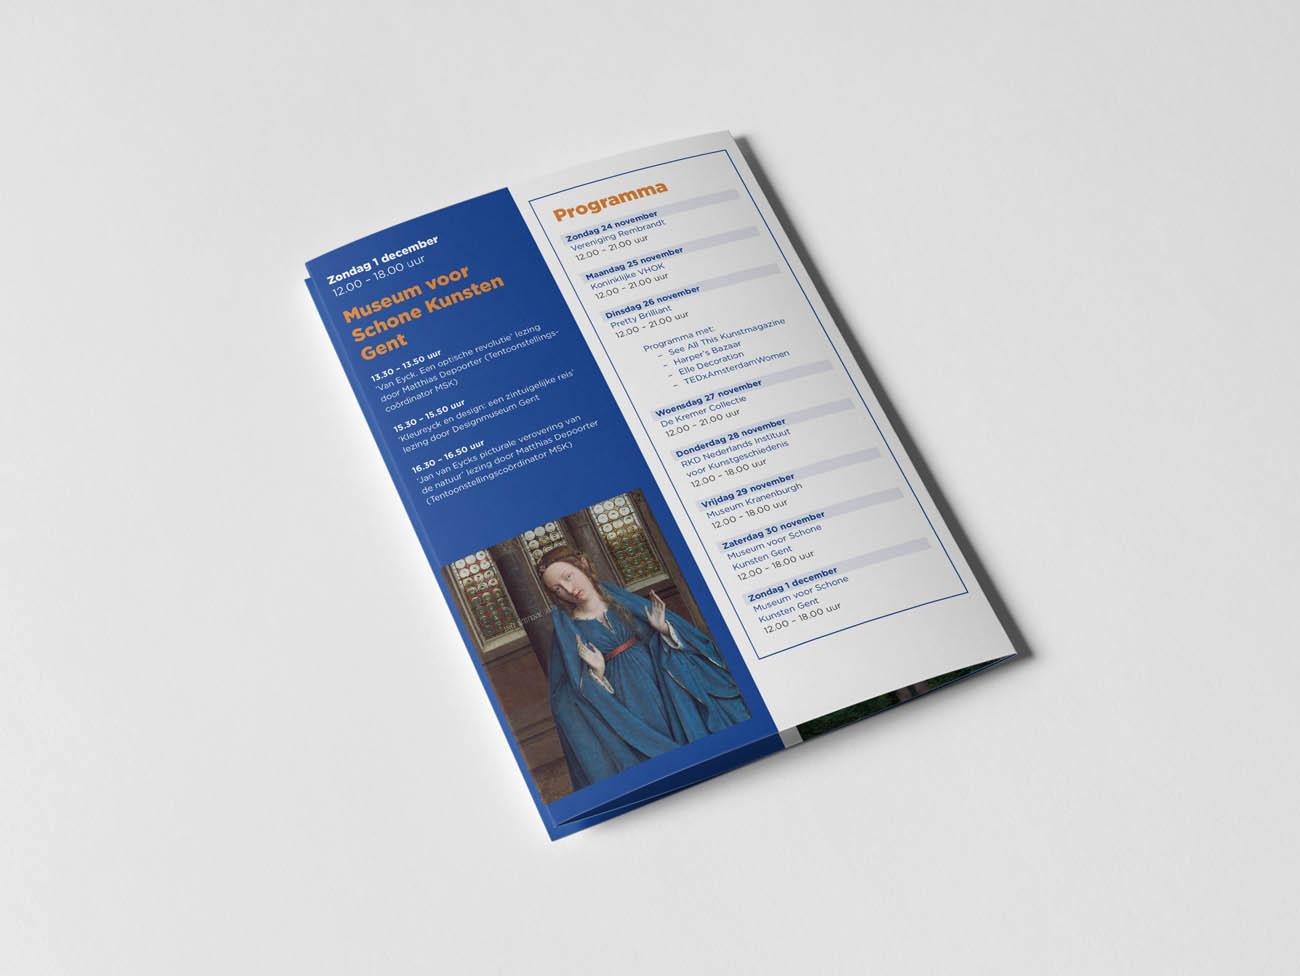 PAN Amsterdam, Amsterdam, 2019, jan taminiau, beurs, kunst, art, fair, antiek, design, grafisch, ontwerp, grafisch ontwerp, graphic design, campagne, erwin olaf, fotografie, folder, pan podium, podium, flyer, editoriaal, erwin olaf, plattegrond, plattegrondbord, folder, bord, signing, beurs, tas